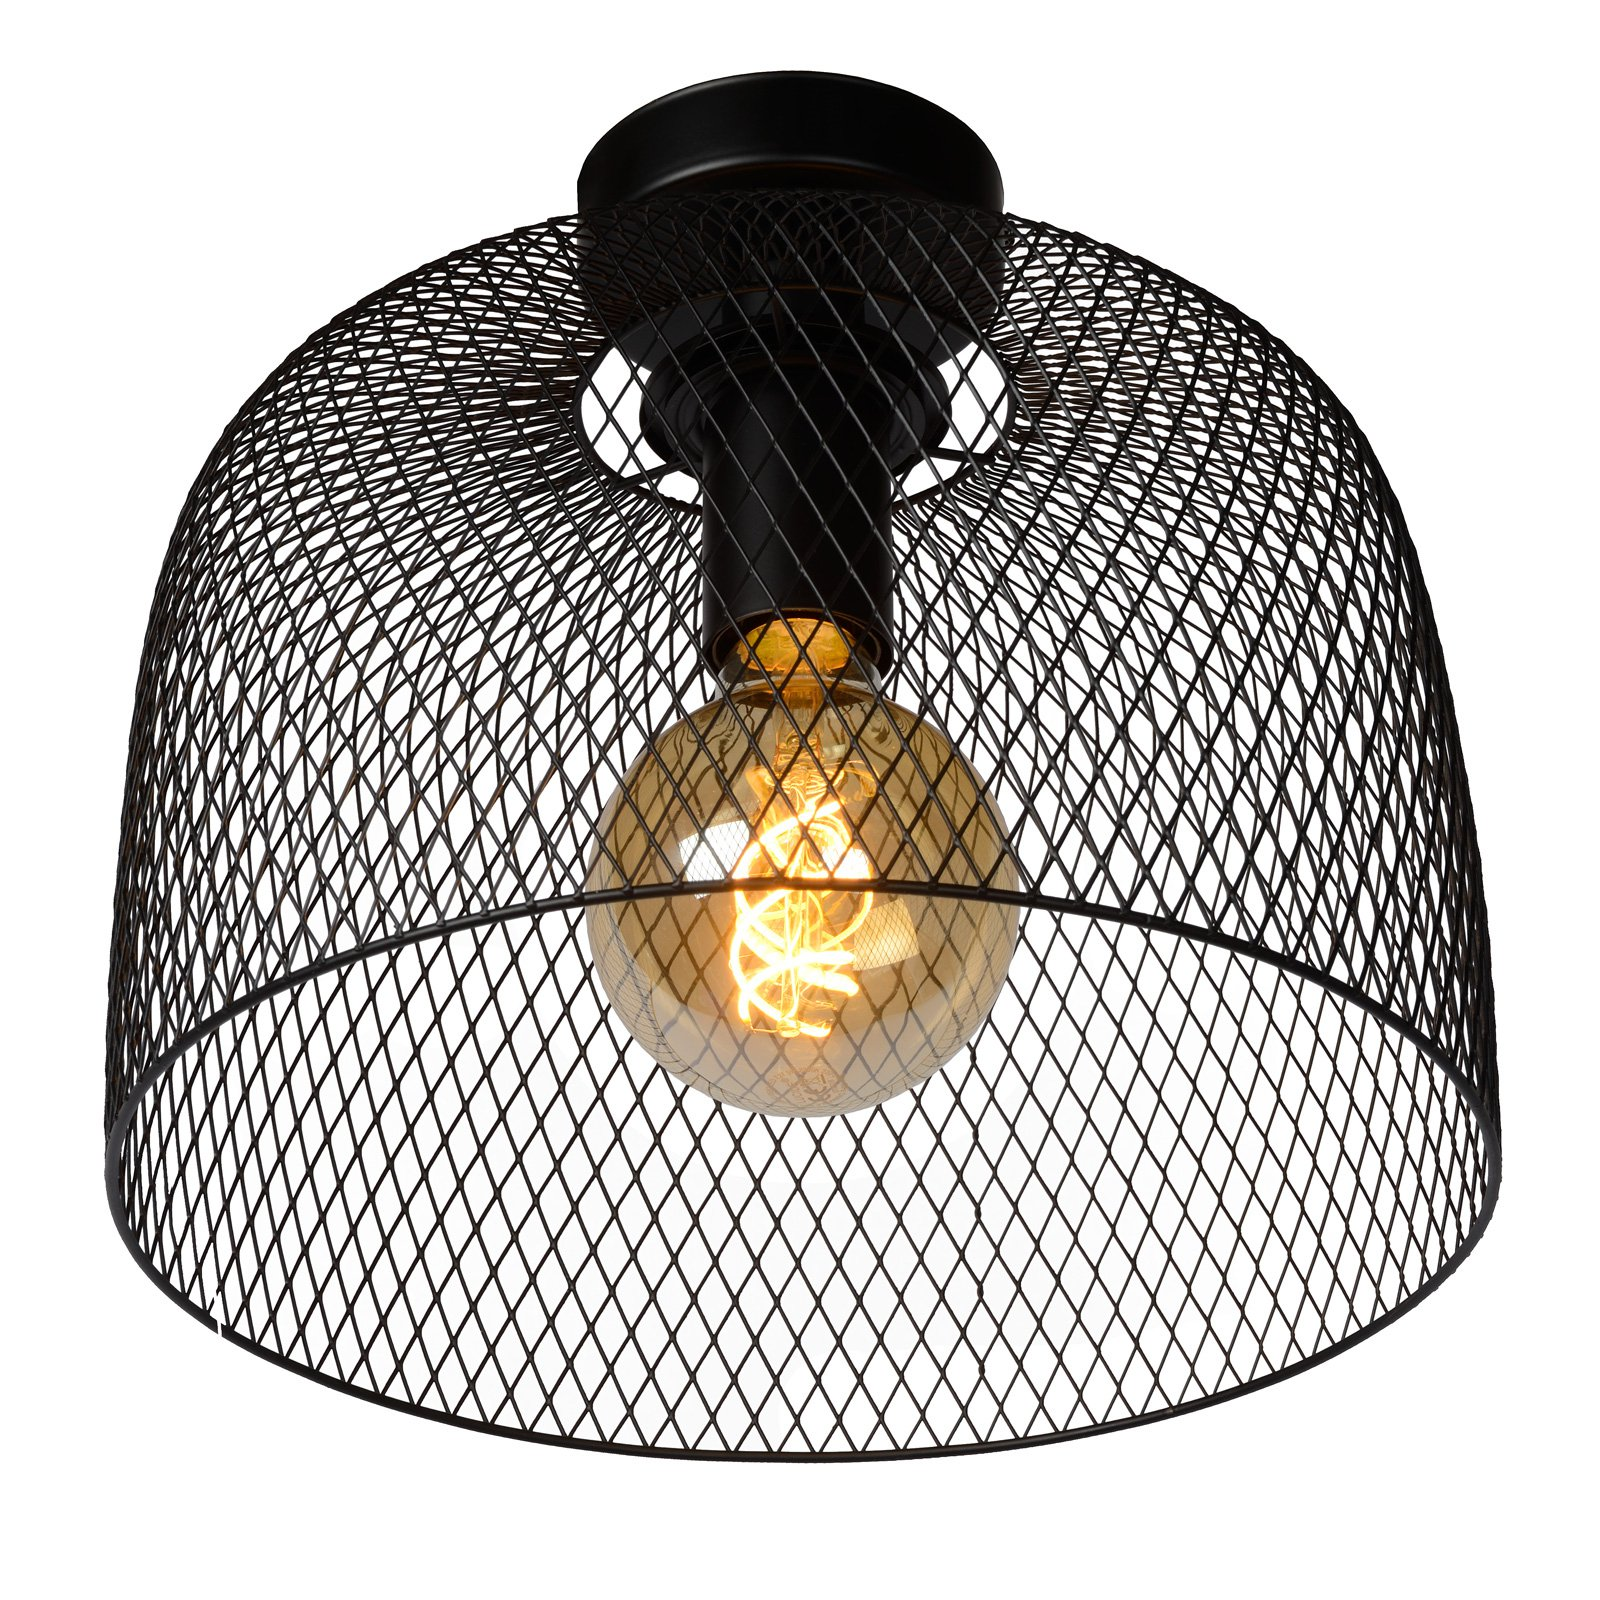 Mesh taklampe Ø 29,5 cm